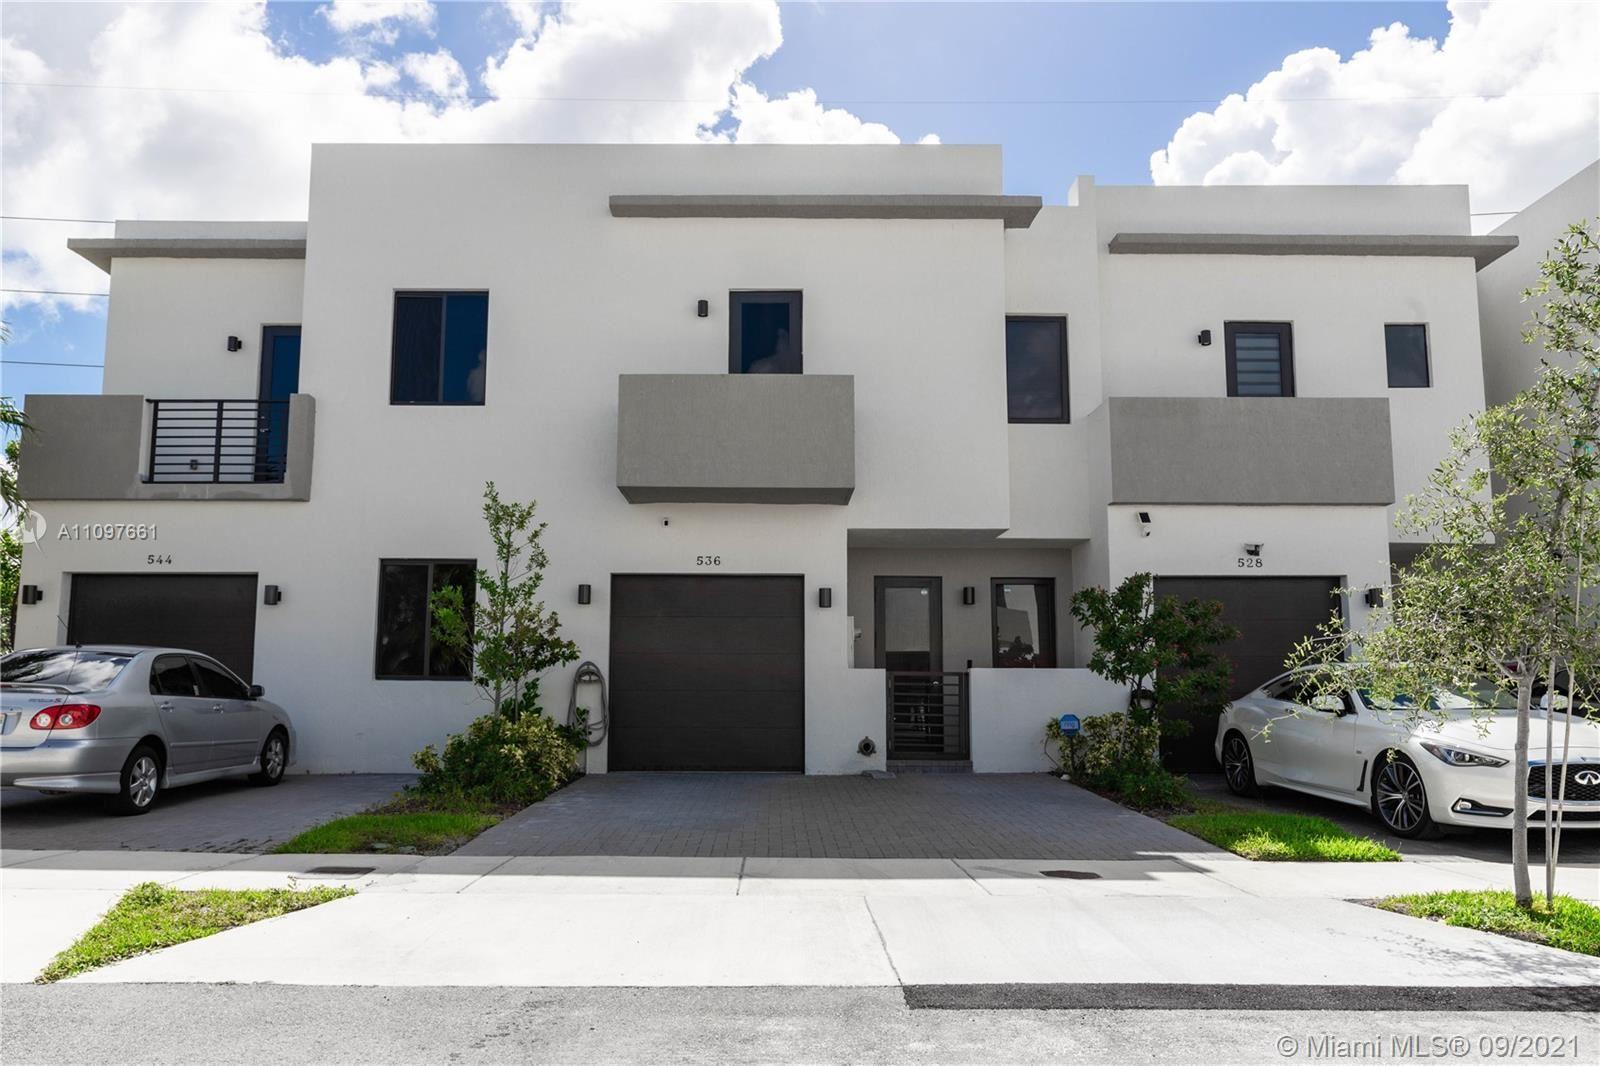 536 SW 91st Pl, Miami, FL 33174 - #: A11097661